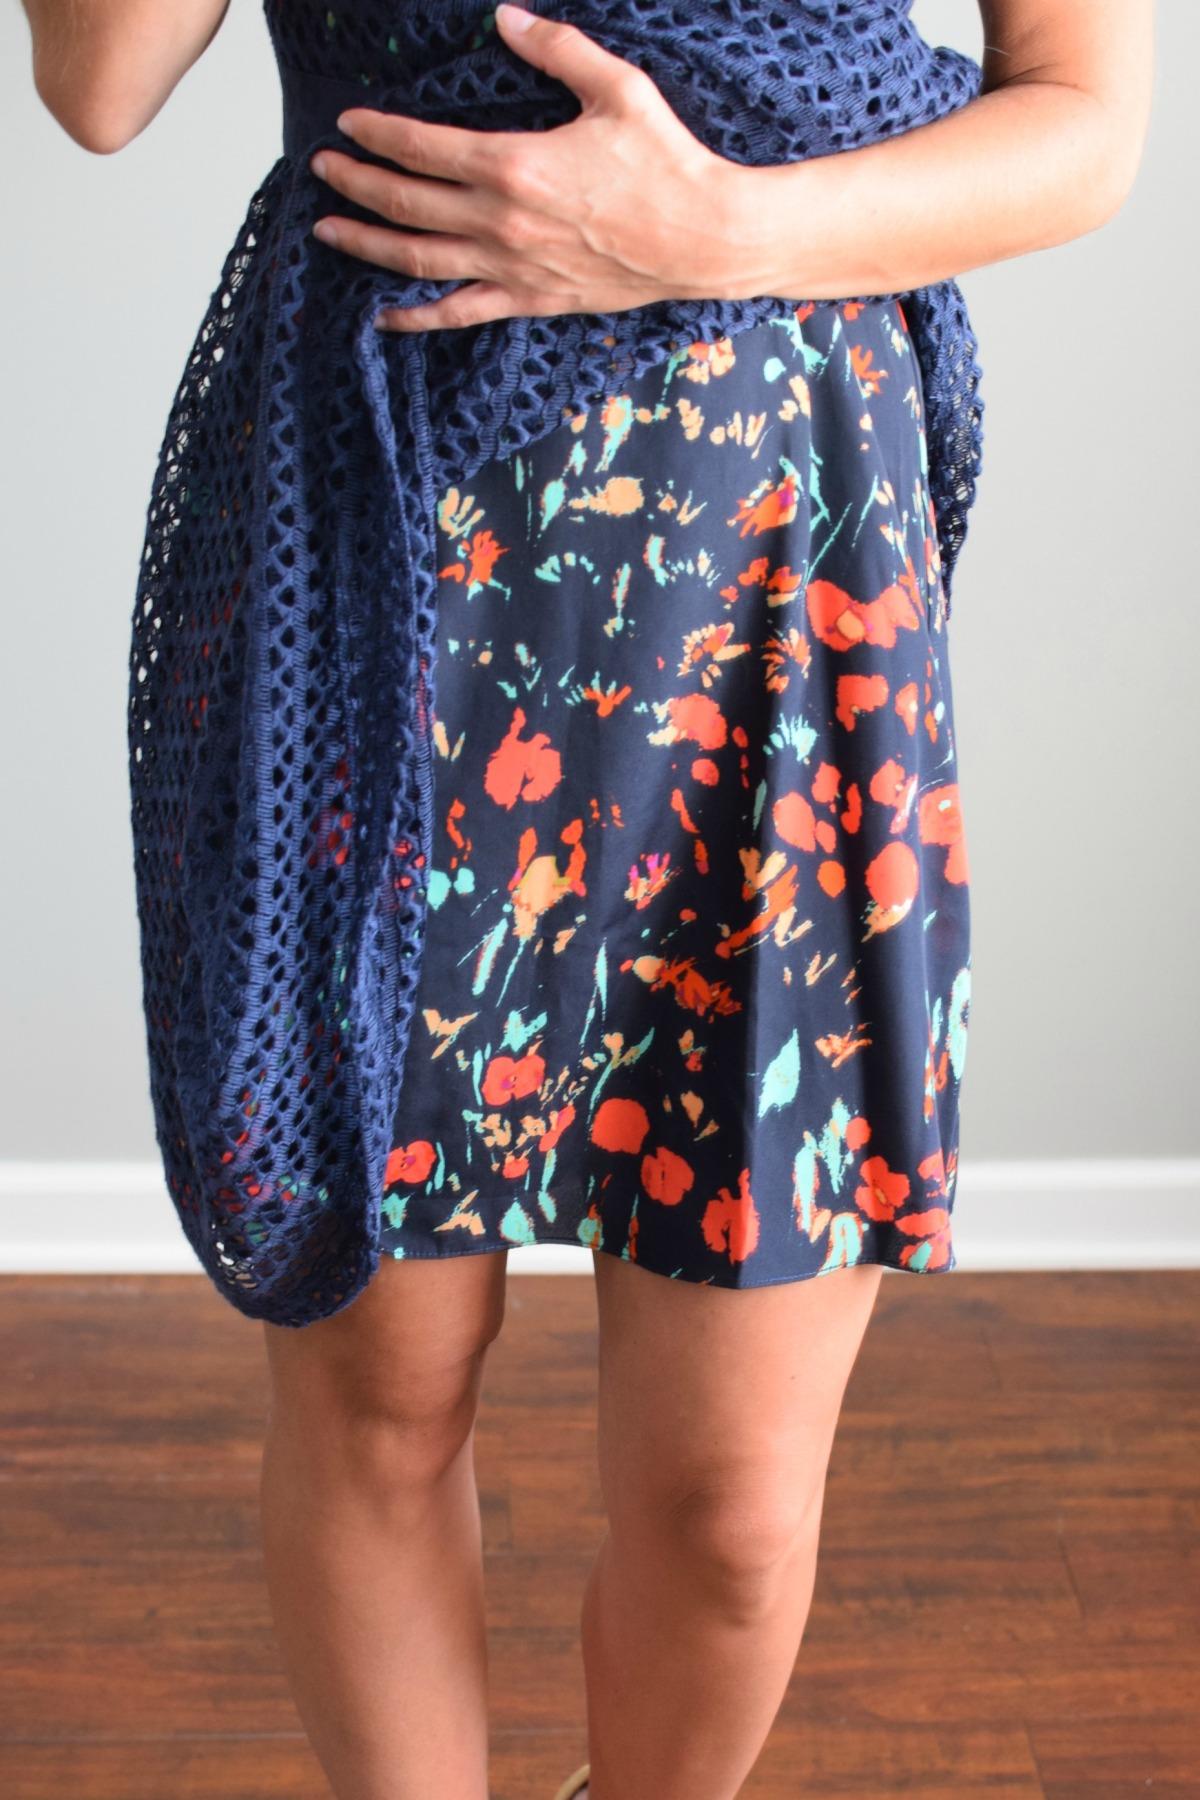 Stitch Fix Review July 2016: Plenty By Tracy Reese Chauna Woven Dress |www.pearlsandsportsbras.com|